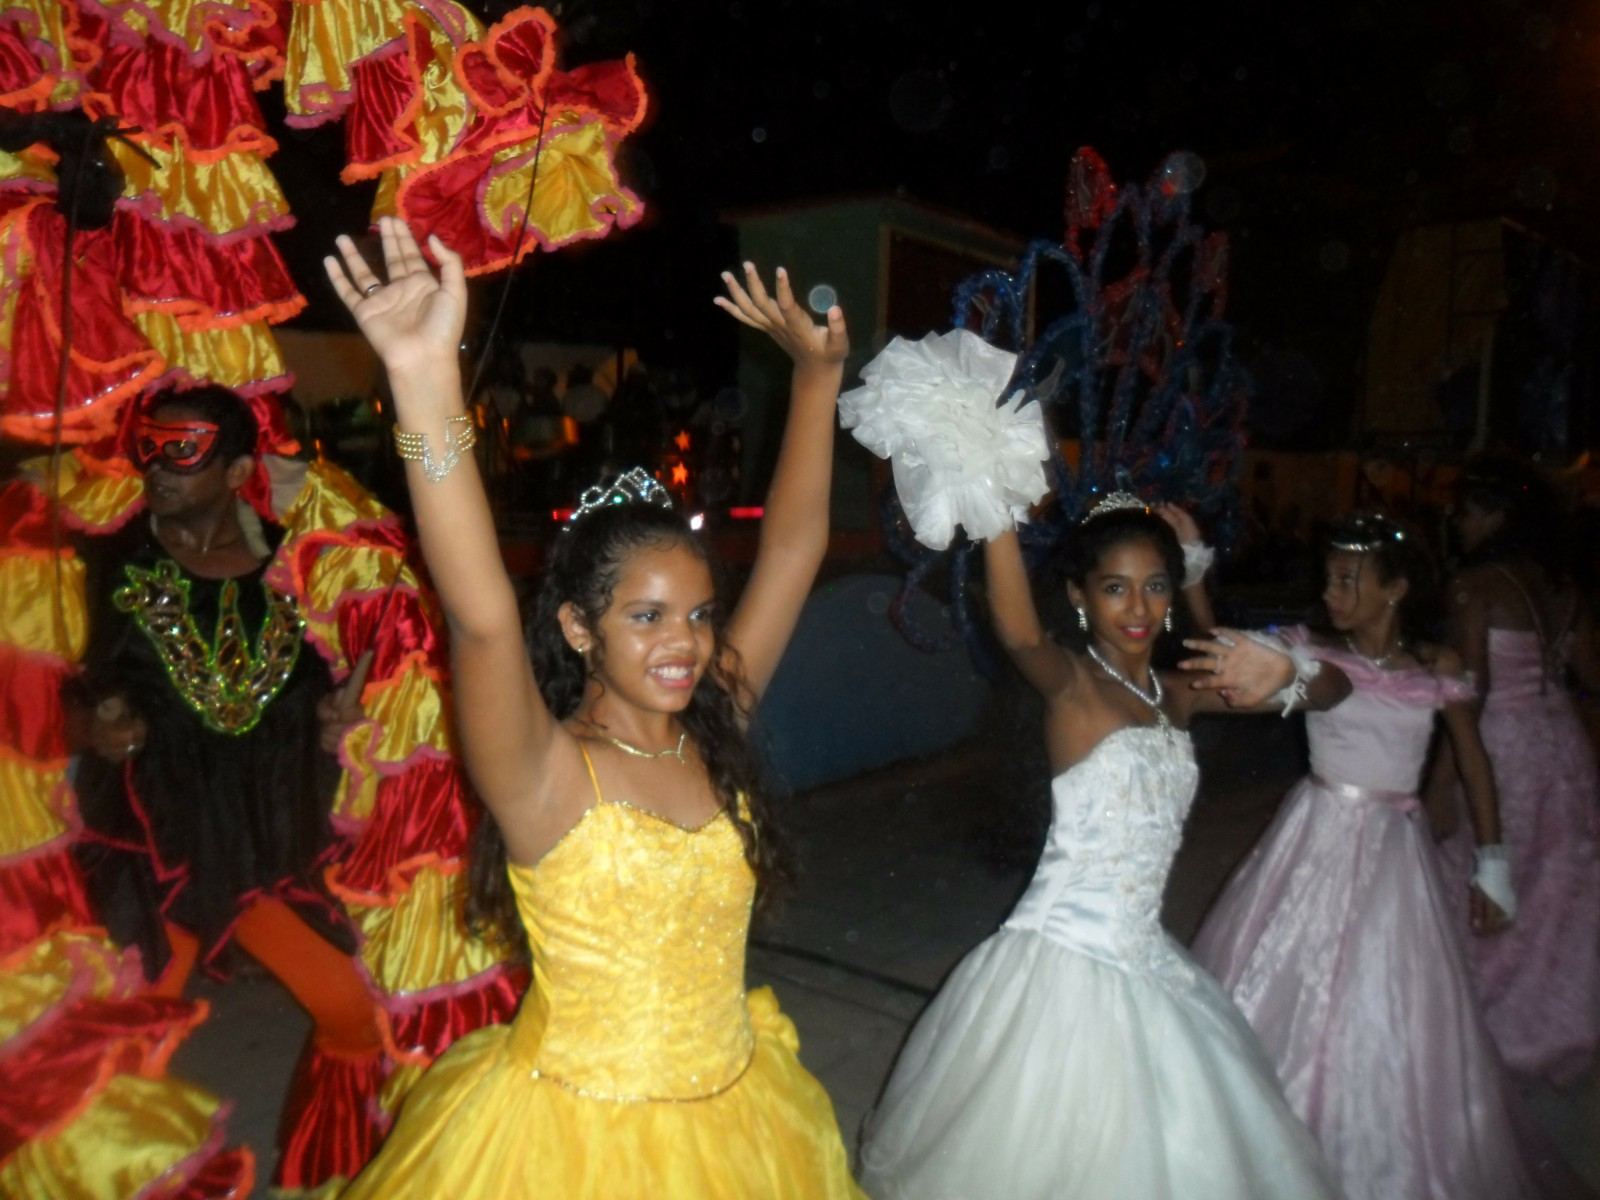 Carnaval infantil divierte a niños manzanilleros (+ fotos)